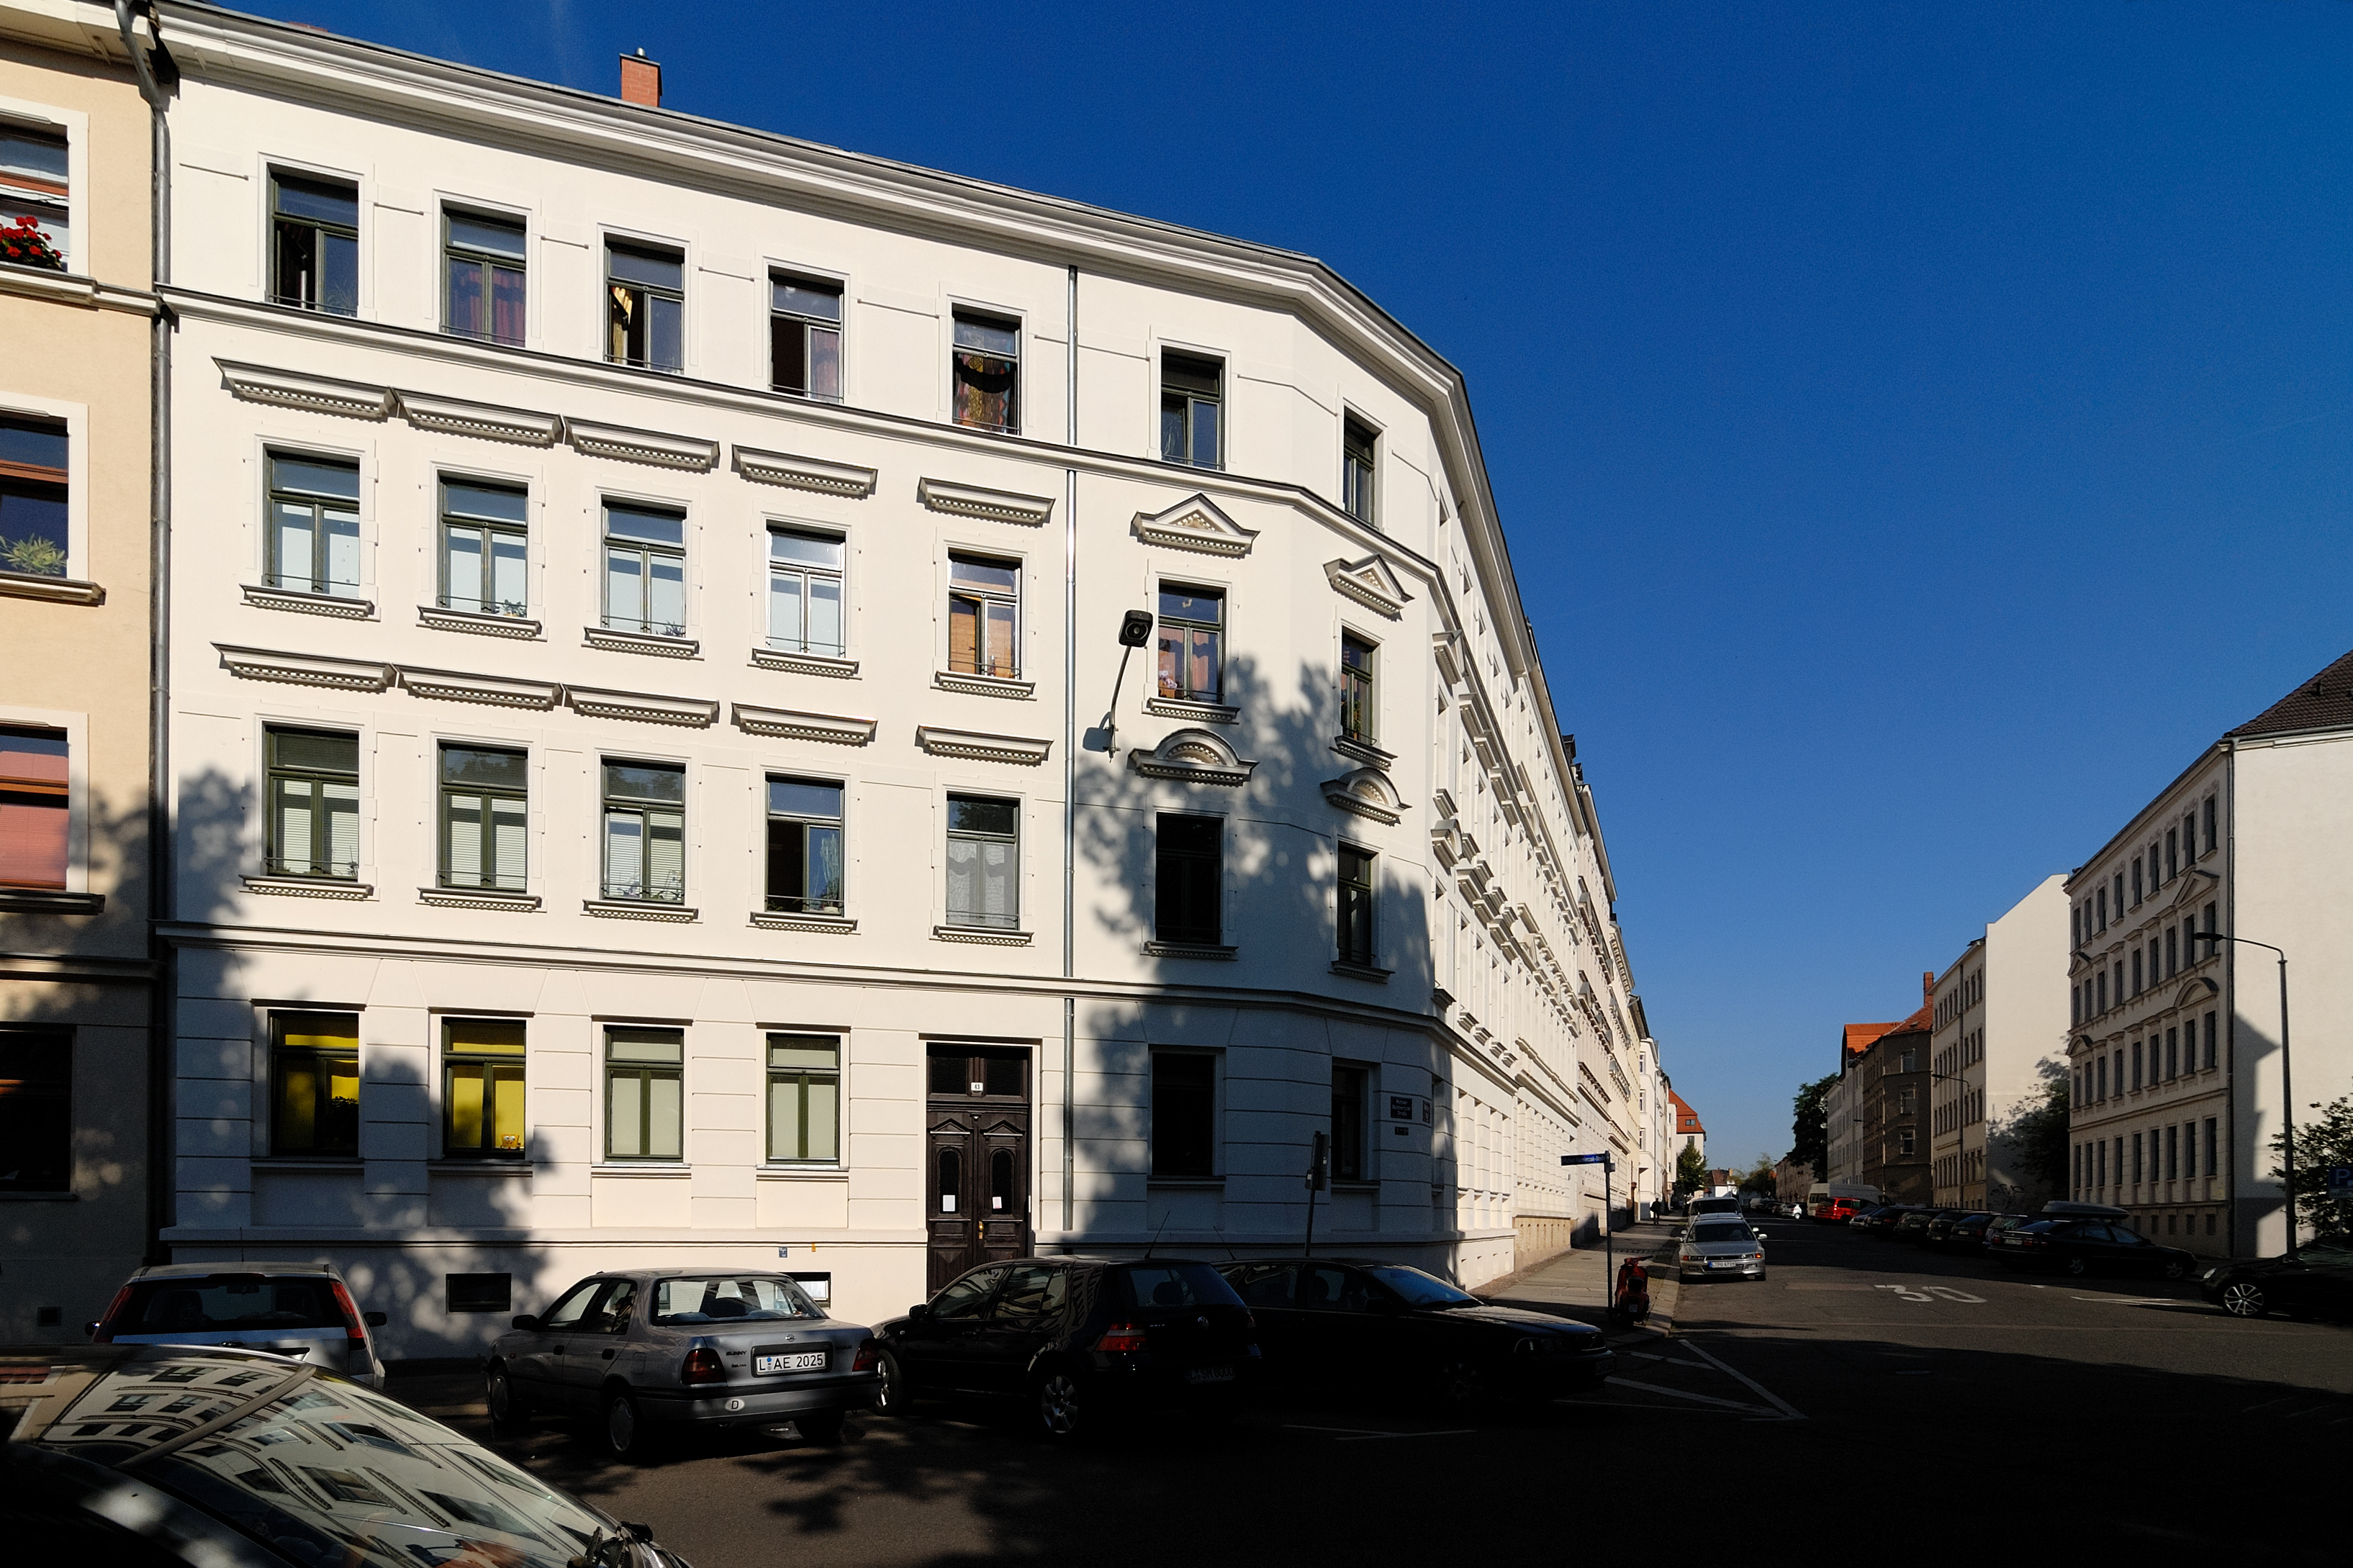 Mich-Karc-Straße